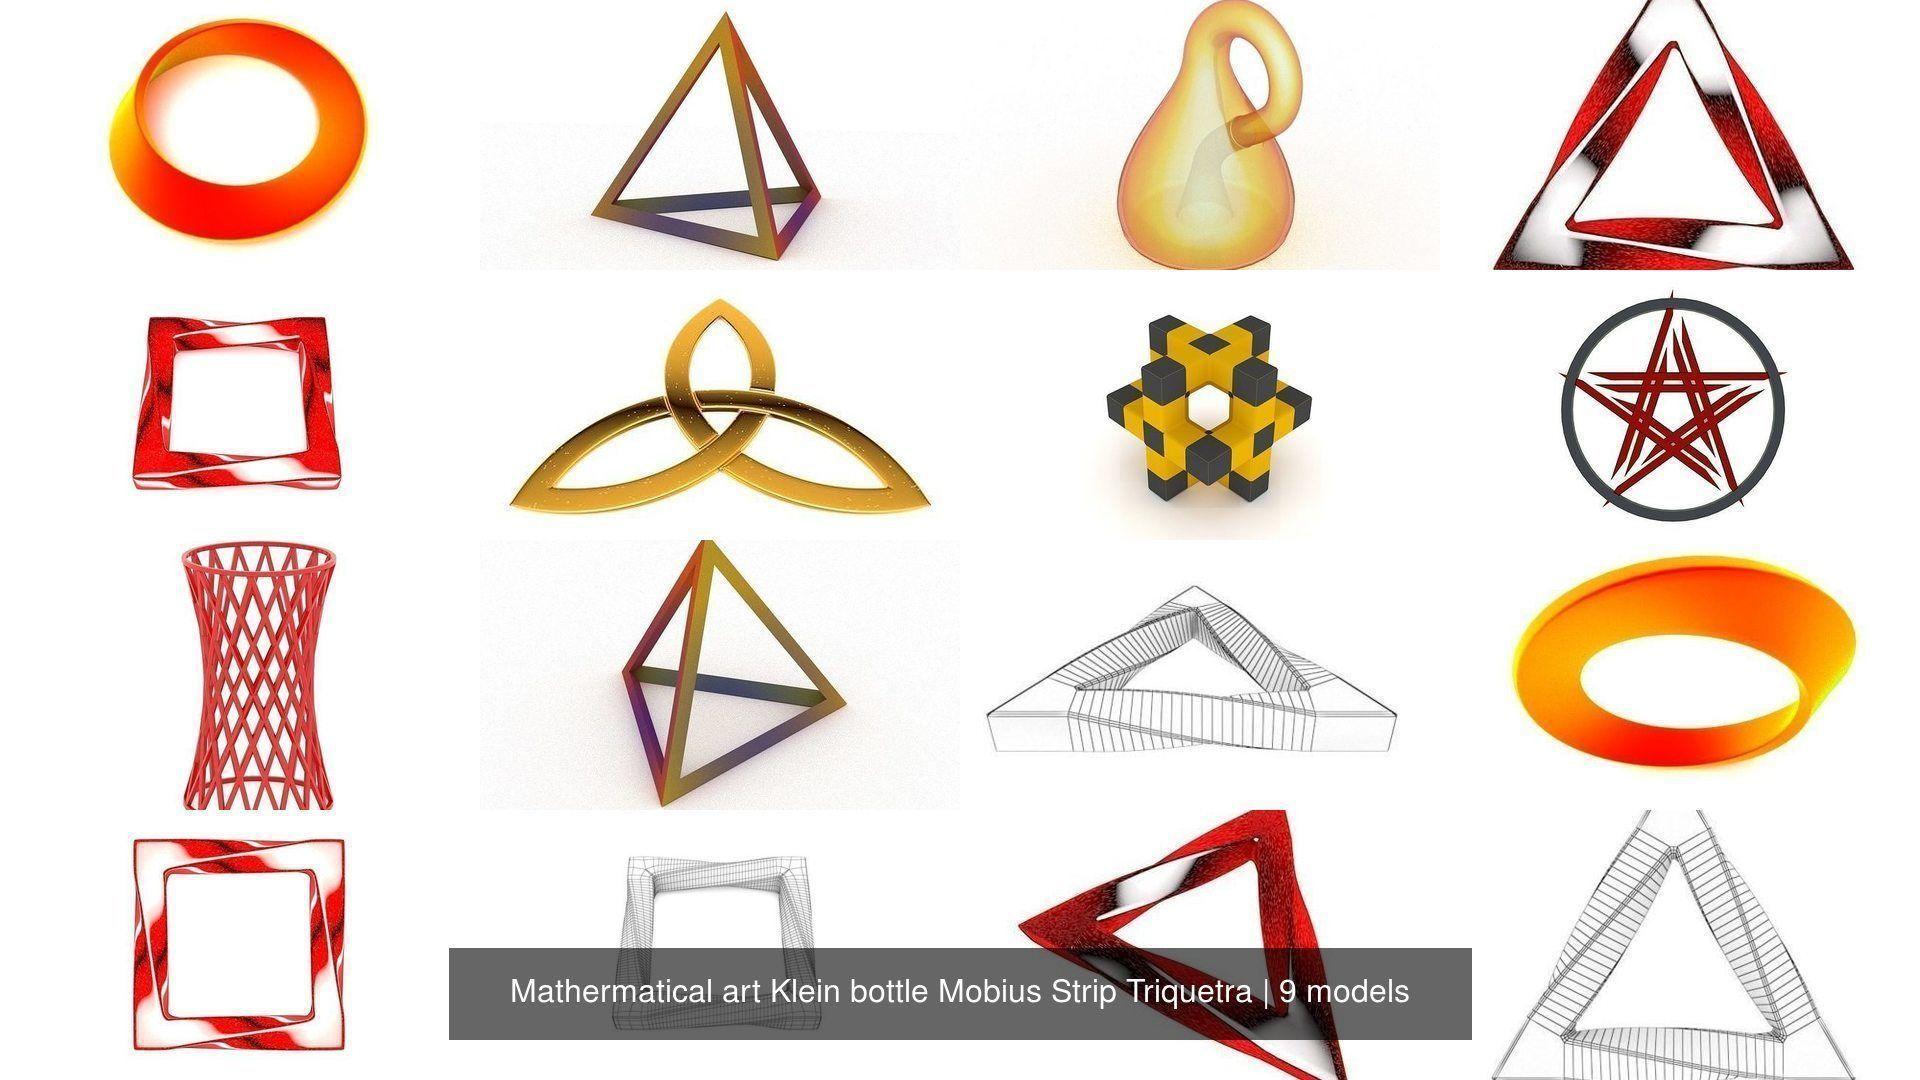 Mathermatical art Klein bottle Mobius Strip Triquetra